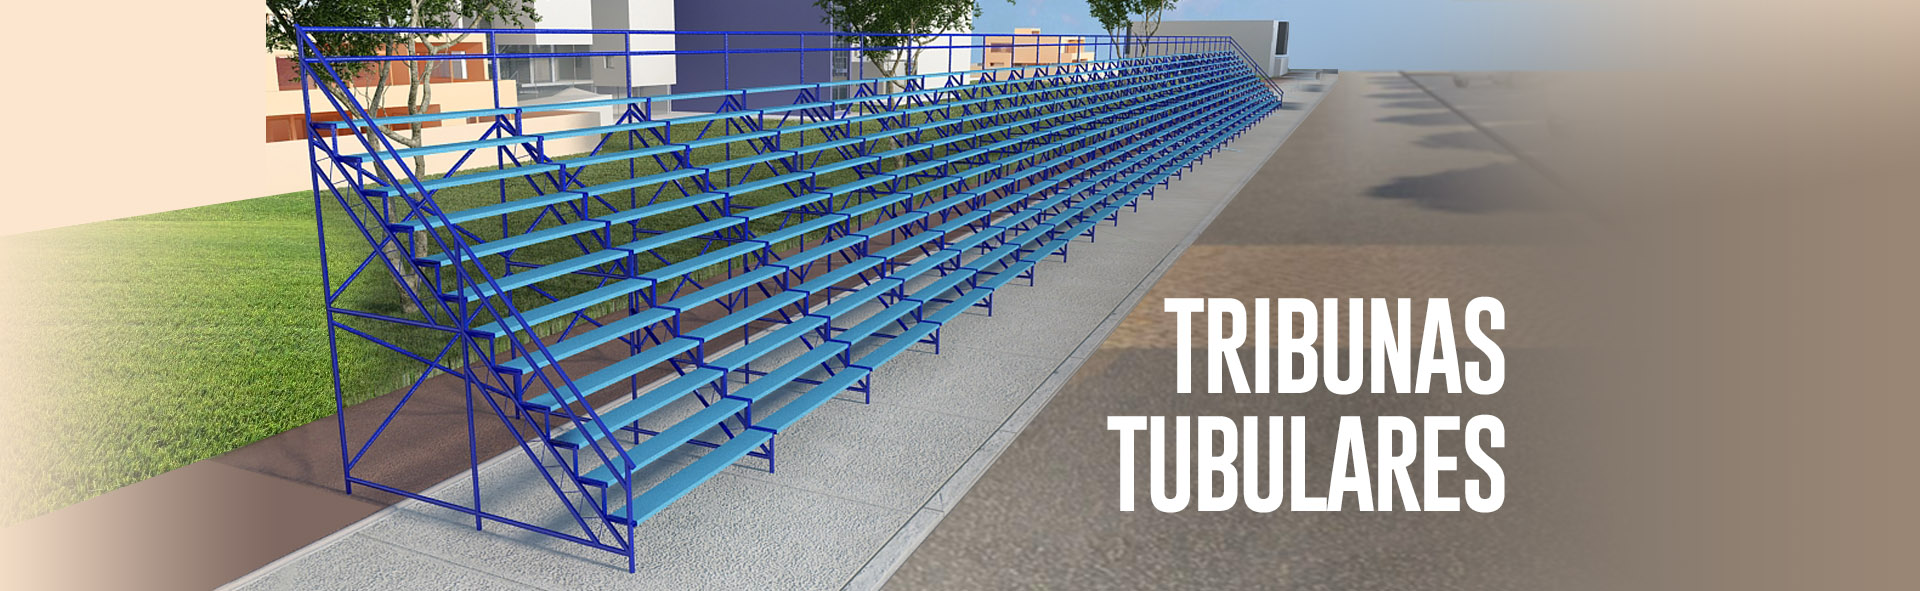 004 – tribunas tubulares nuevos aires net